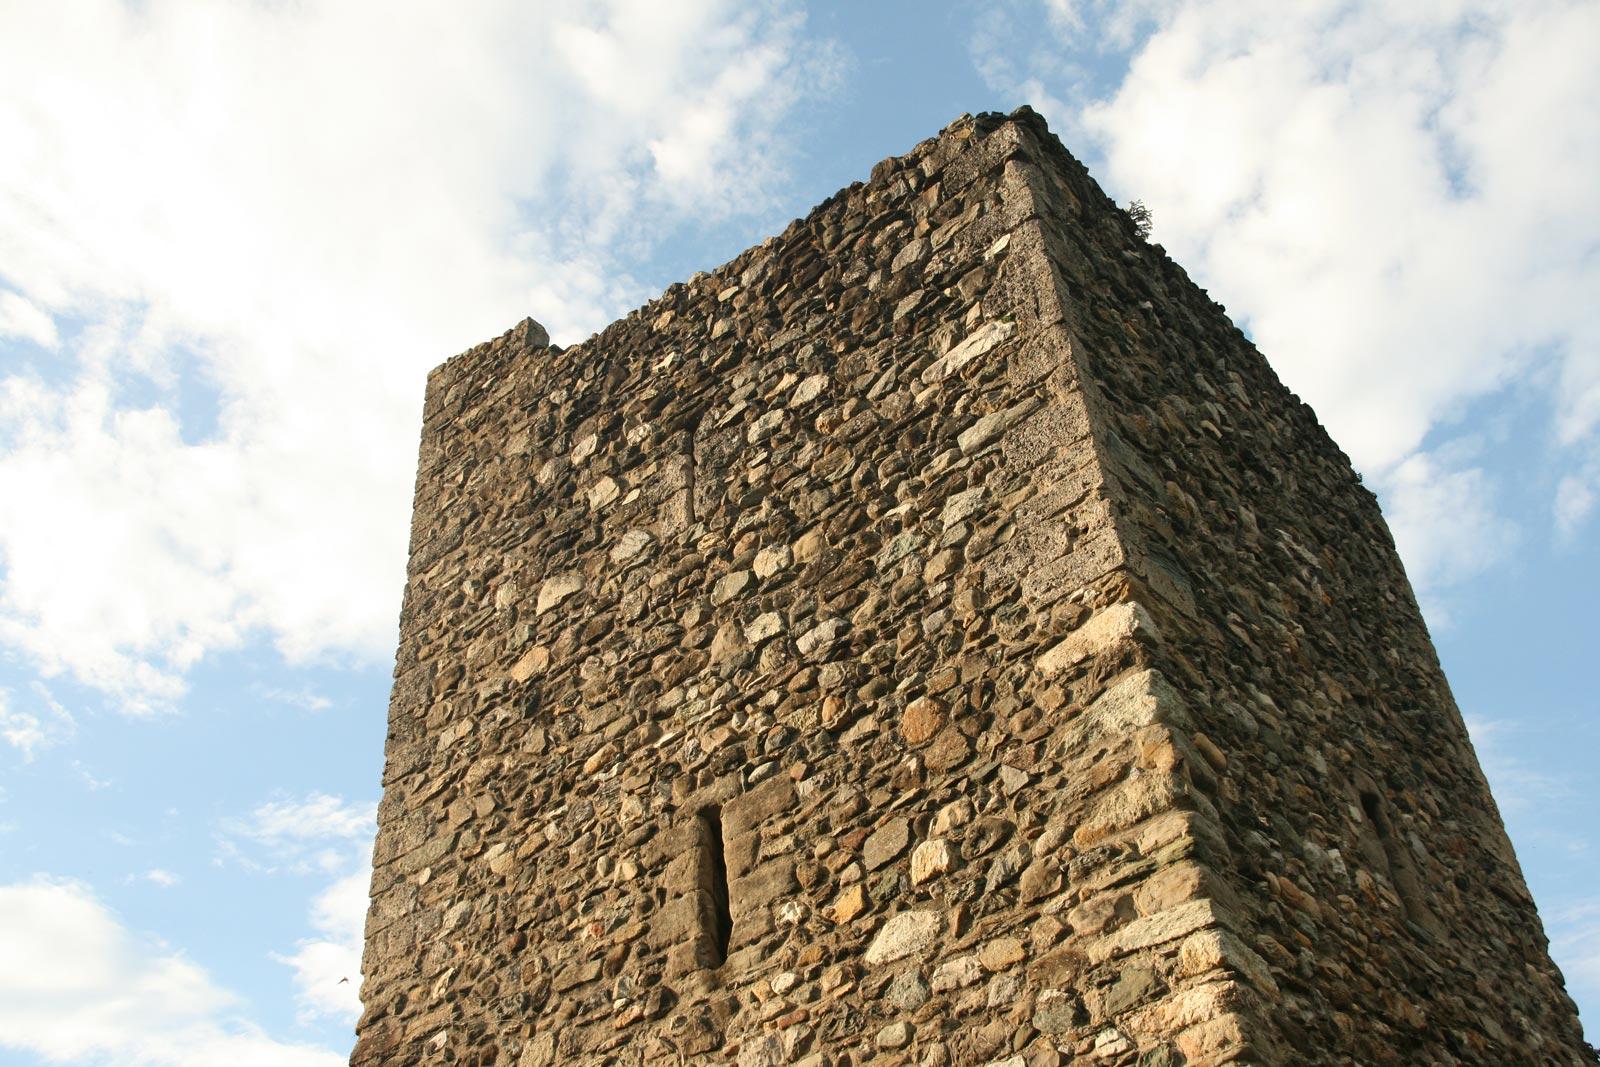 Yvoire en Suisse fortifications